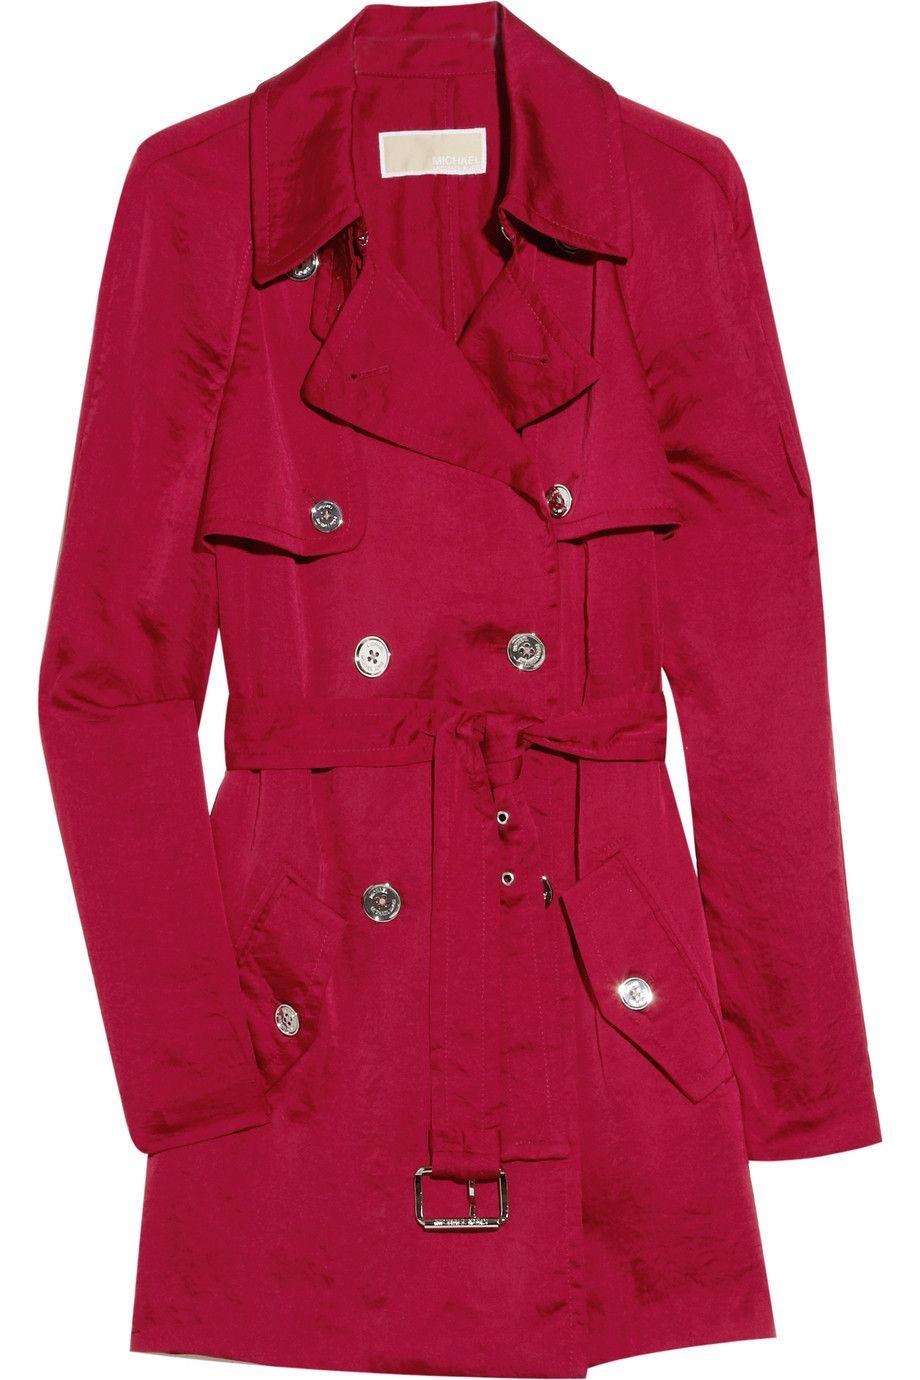 Satin trench coat  by MICHAEL Michael Kors